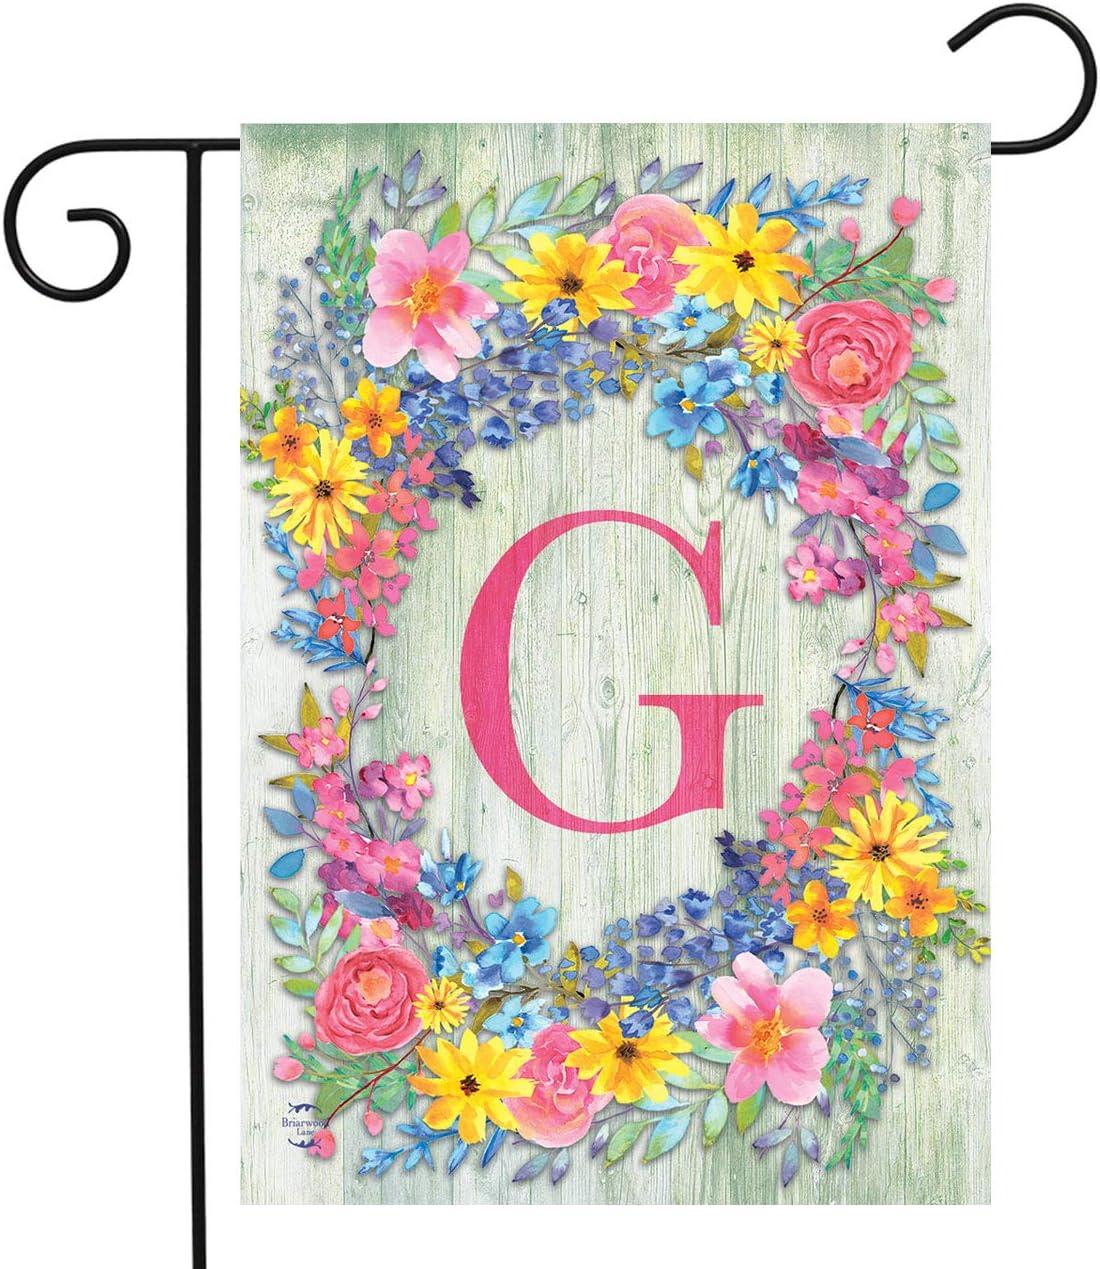 "Briarwood Lane Spring Monogram Letter G Garden Flag Floral Wreath 12.5"" x 18"""